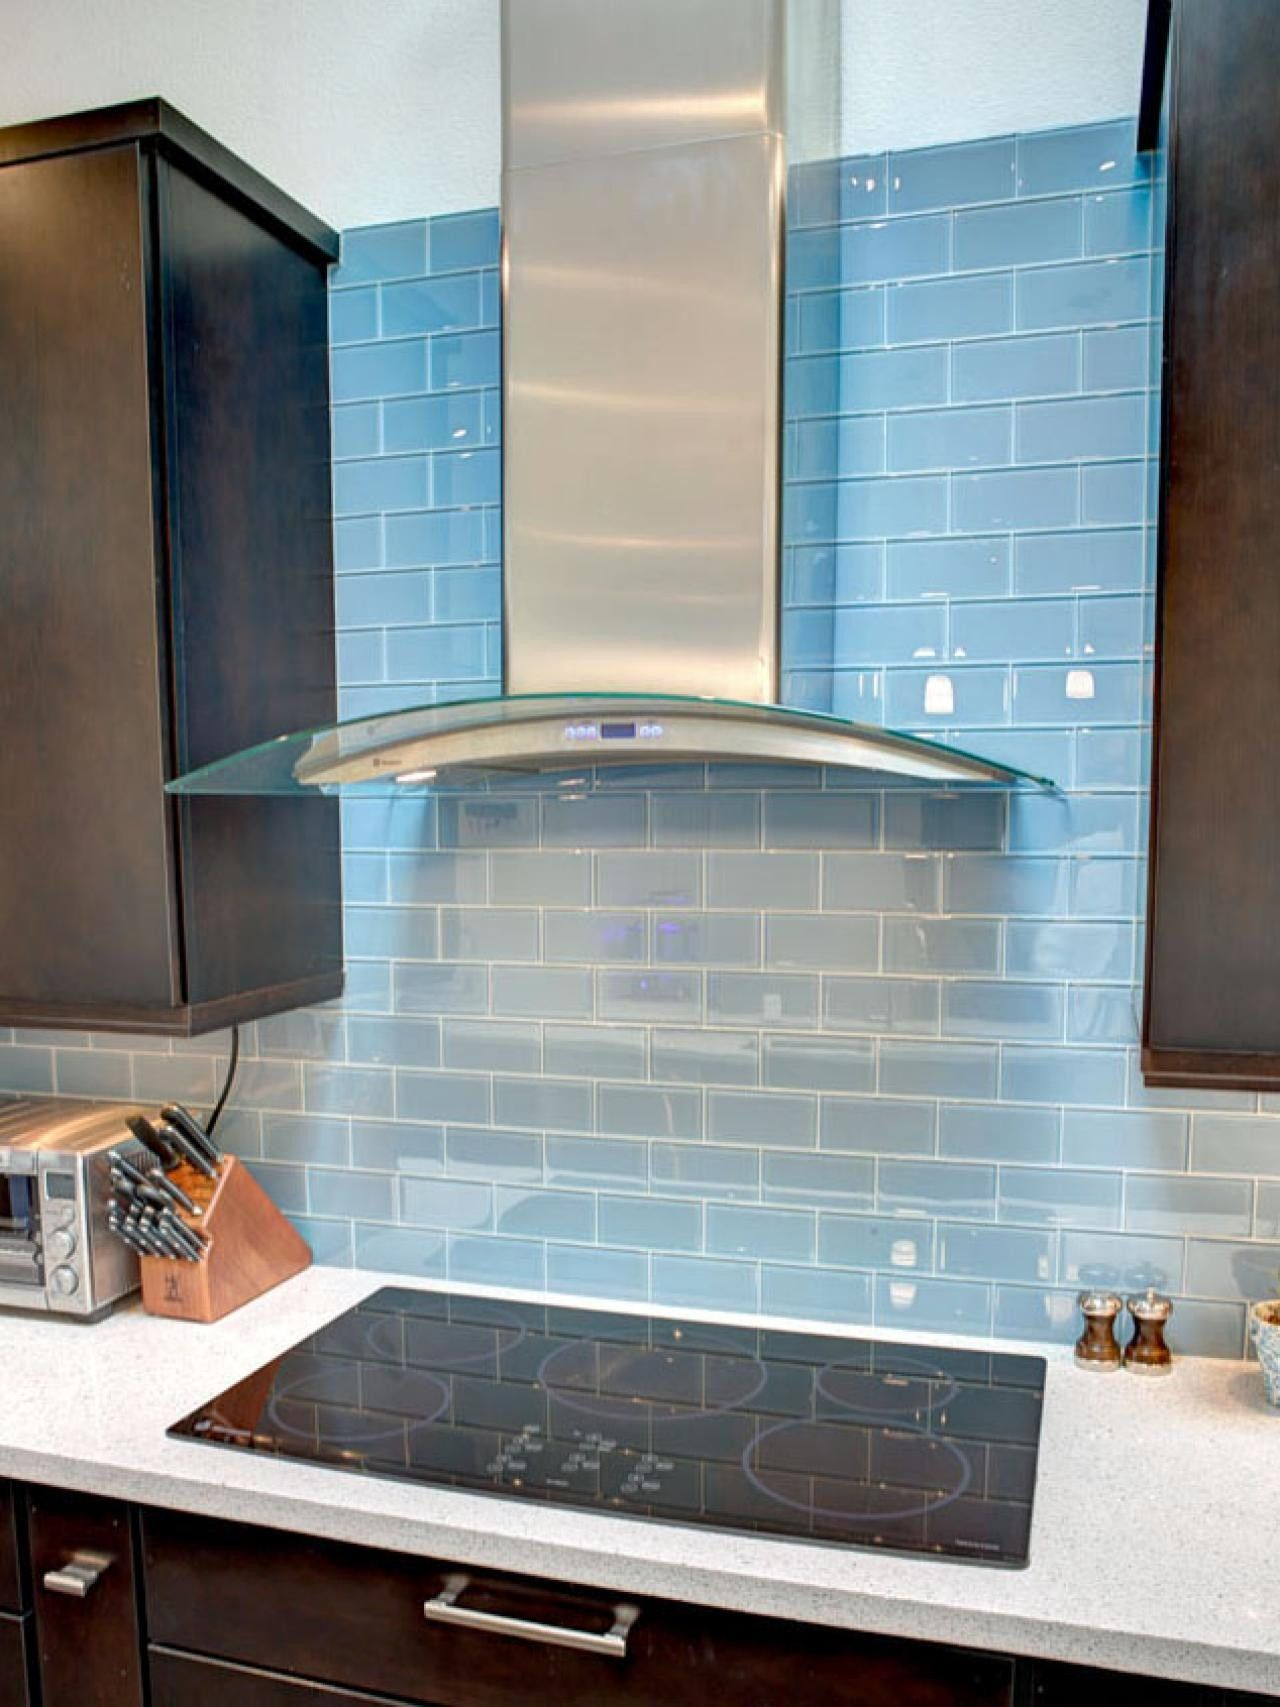 tile backsplash behind range hood Kitchen Idea